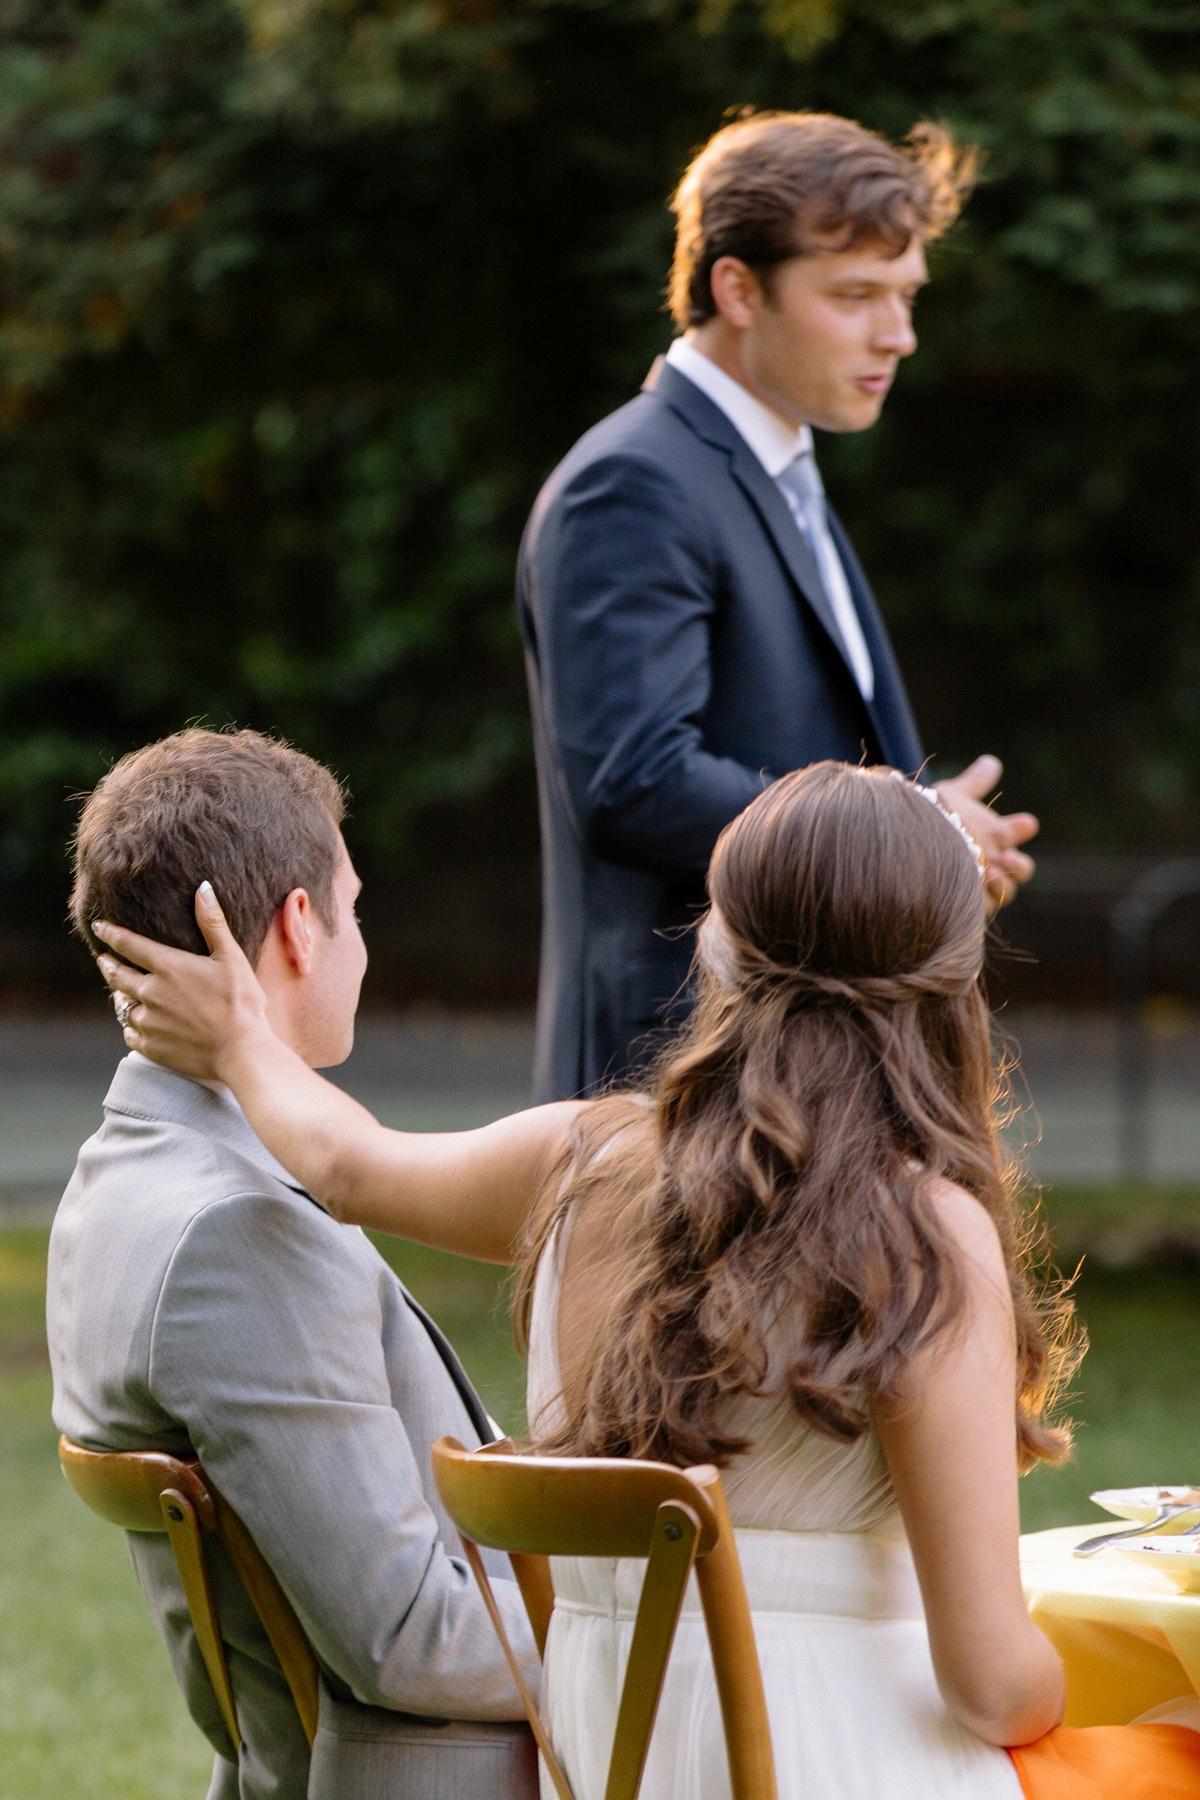 best man giving toast at a backyard wedding